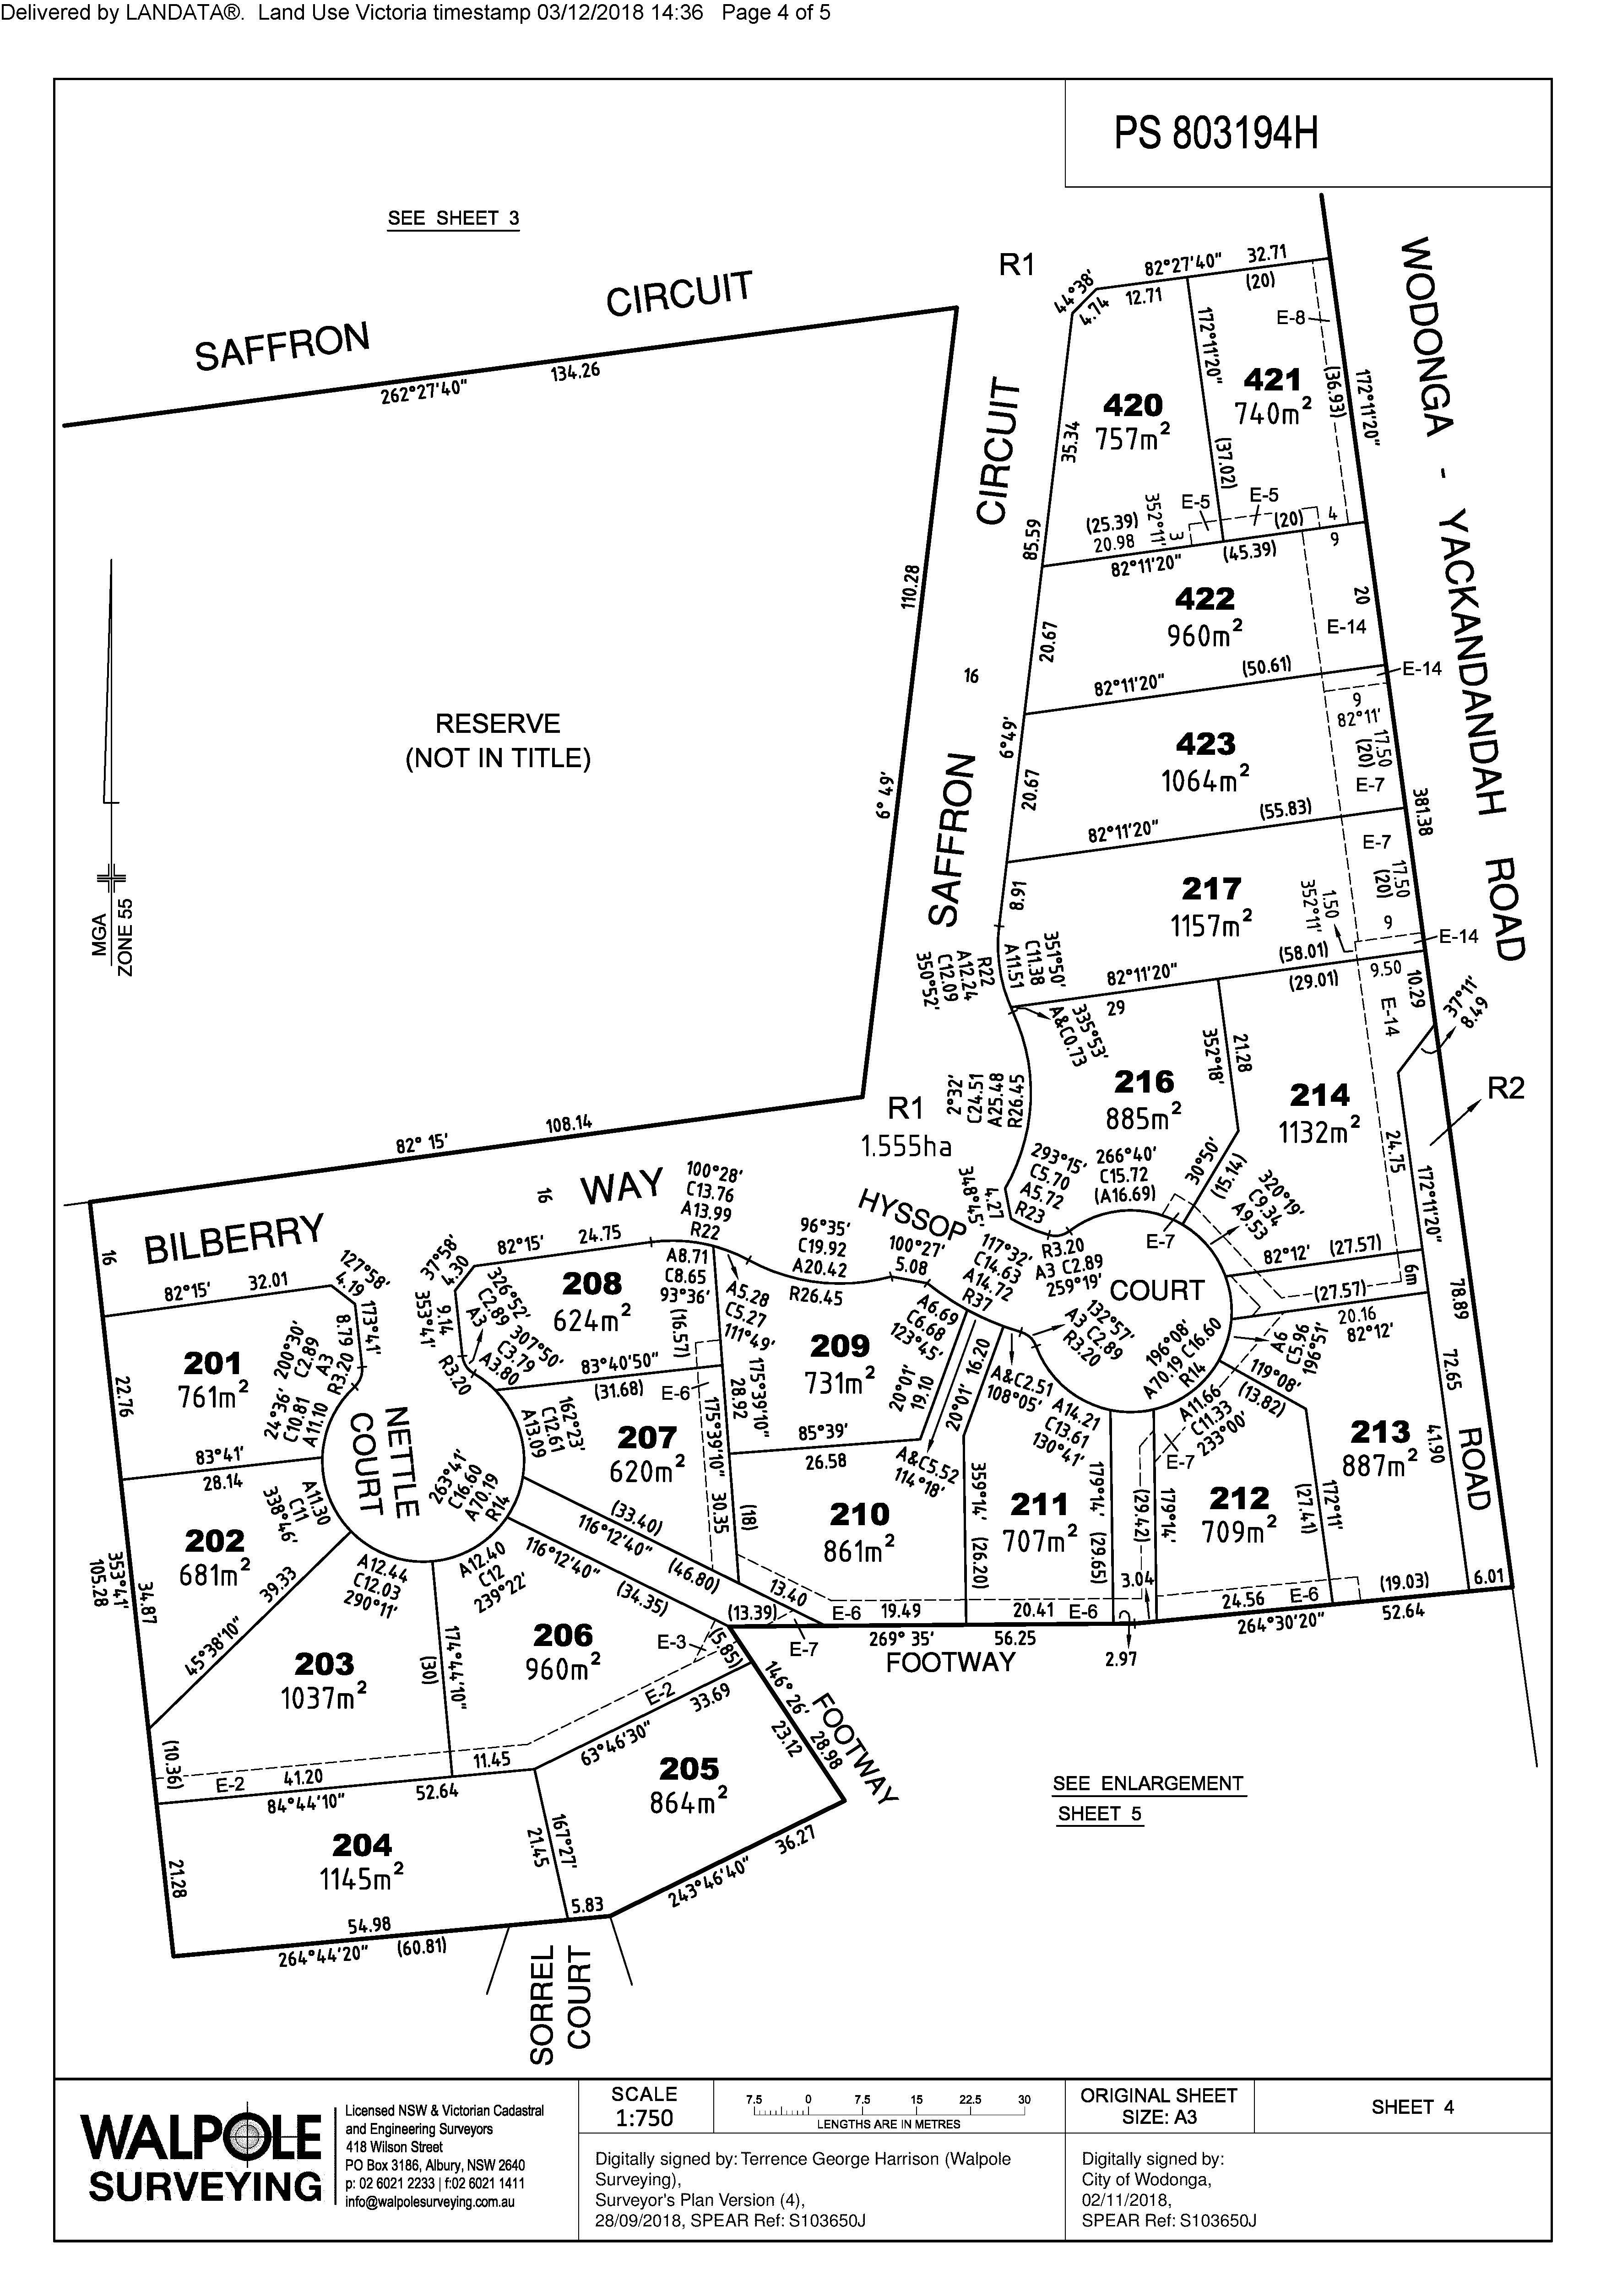 Baranduda-Grove-Site-34-39lots-PS803194H-registered-031218.jpg